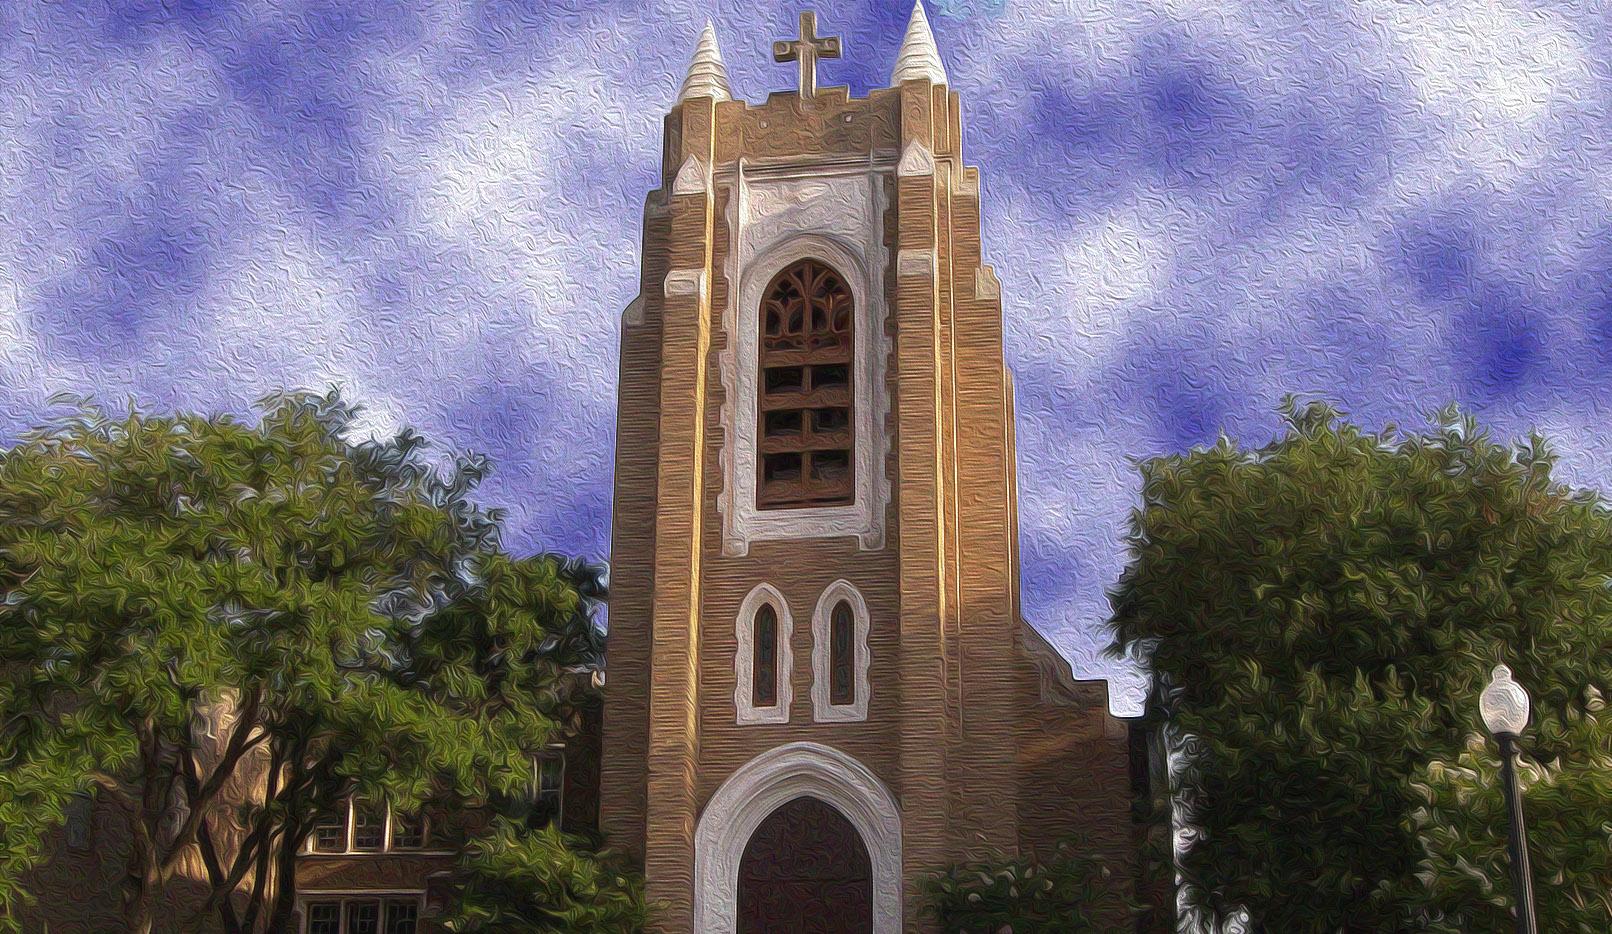 Saint_andrews_episcopal_church_2009 EDIT